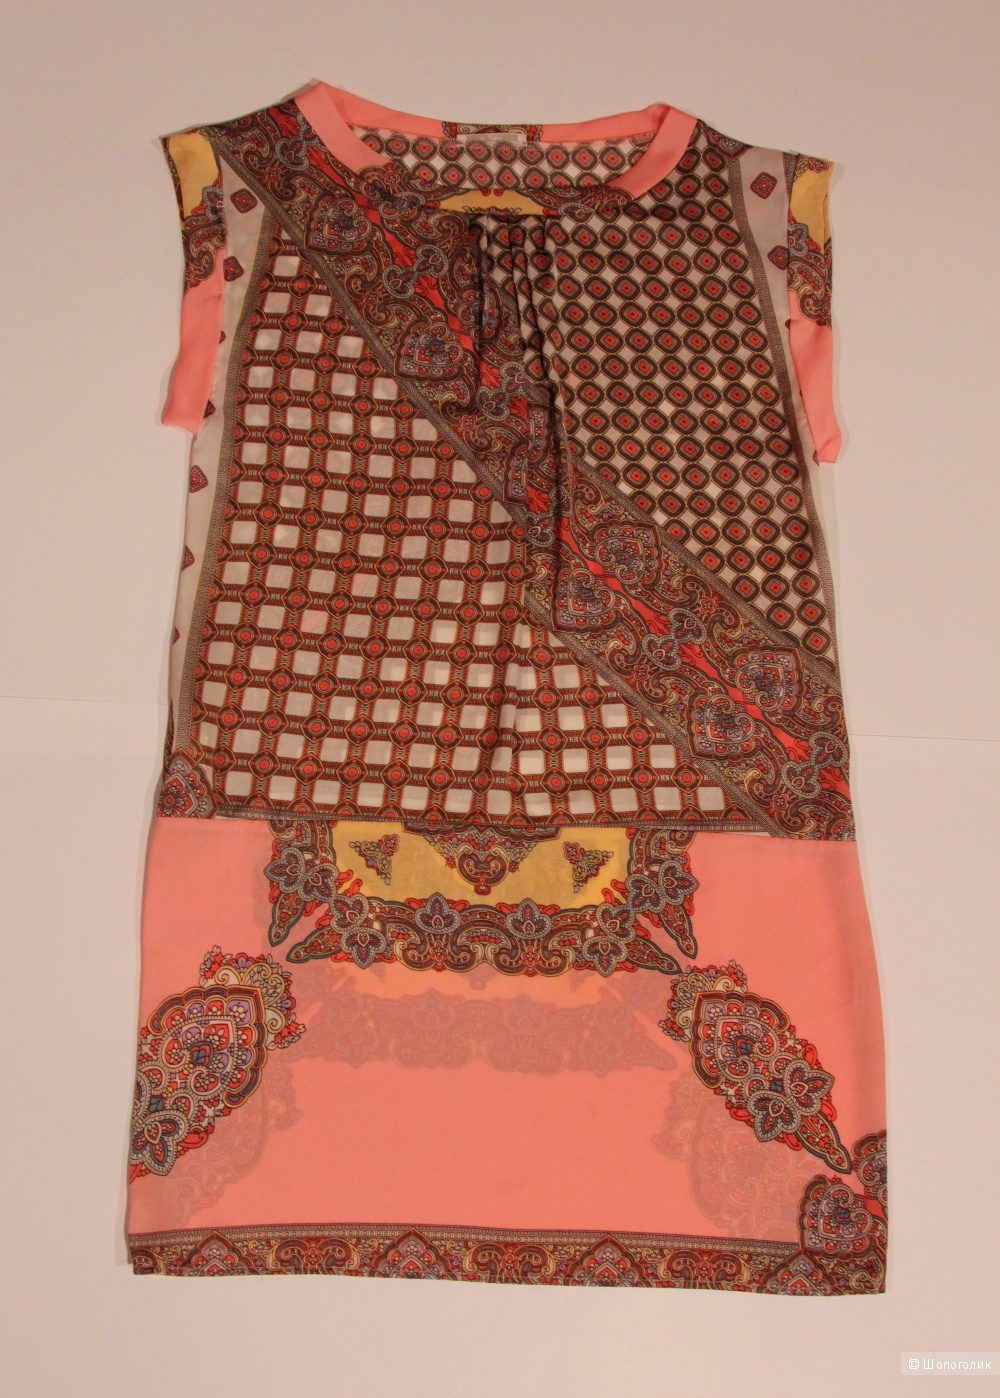 Сет из 2-х платьев бренда 2026 и Lo You размер 44-46(М)